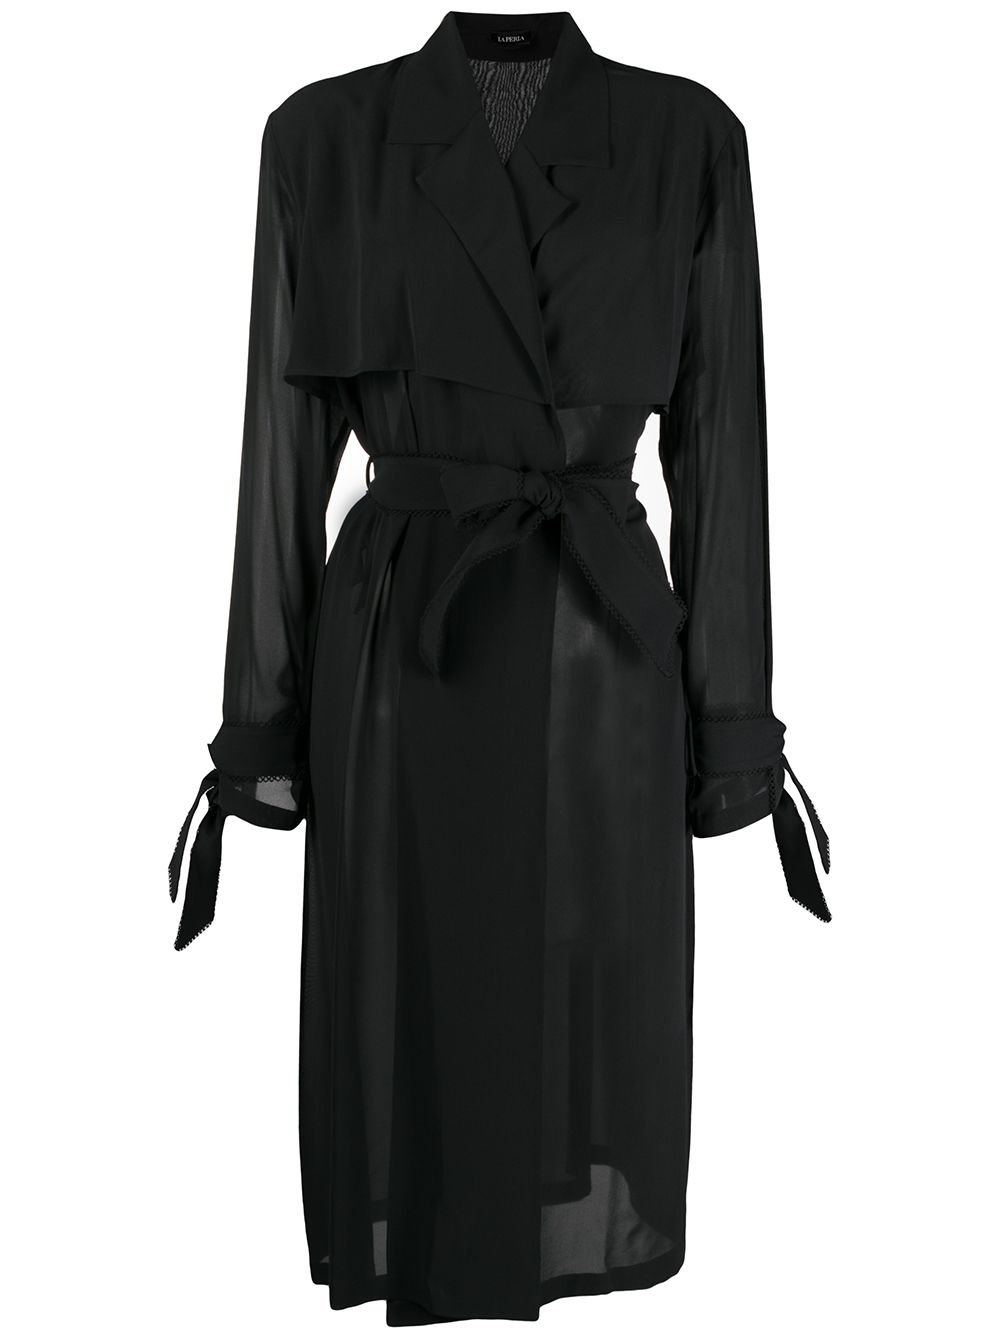 Good Vibrations Silk Nightgown